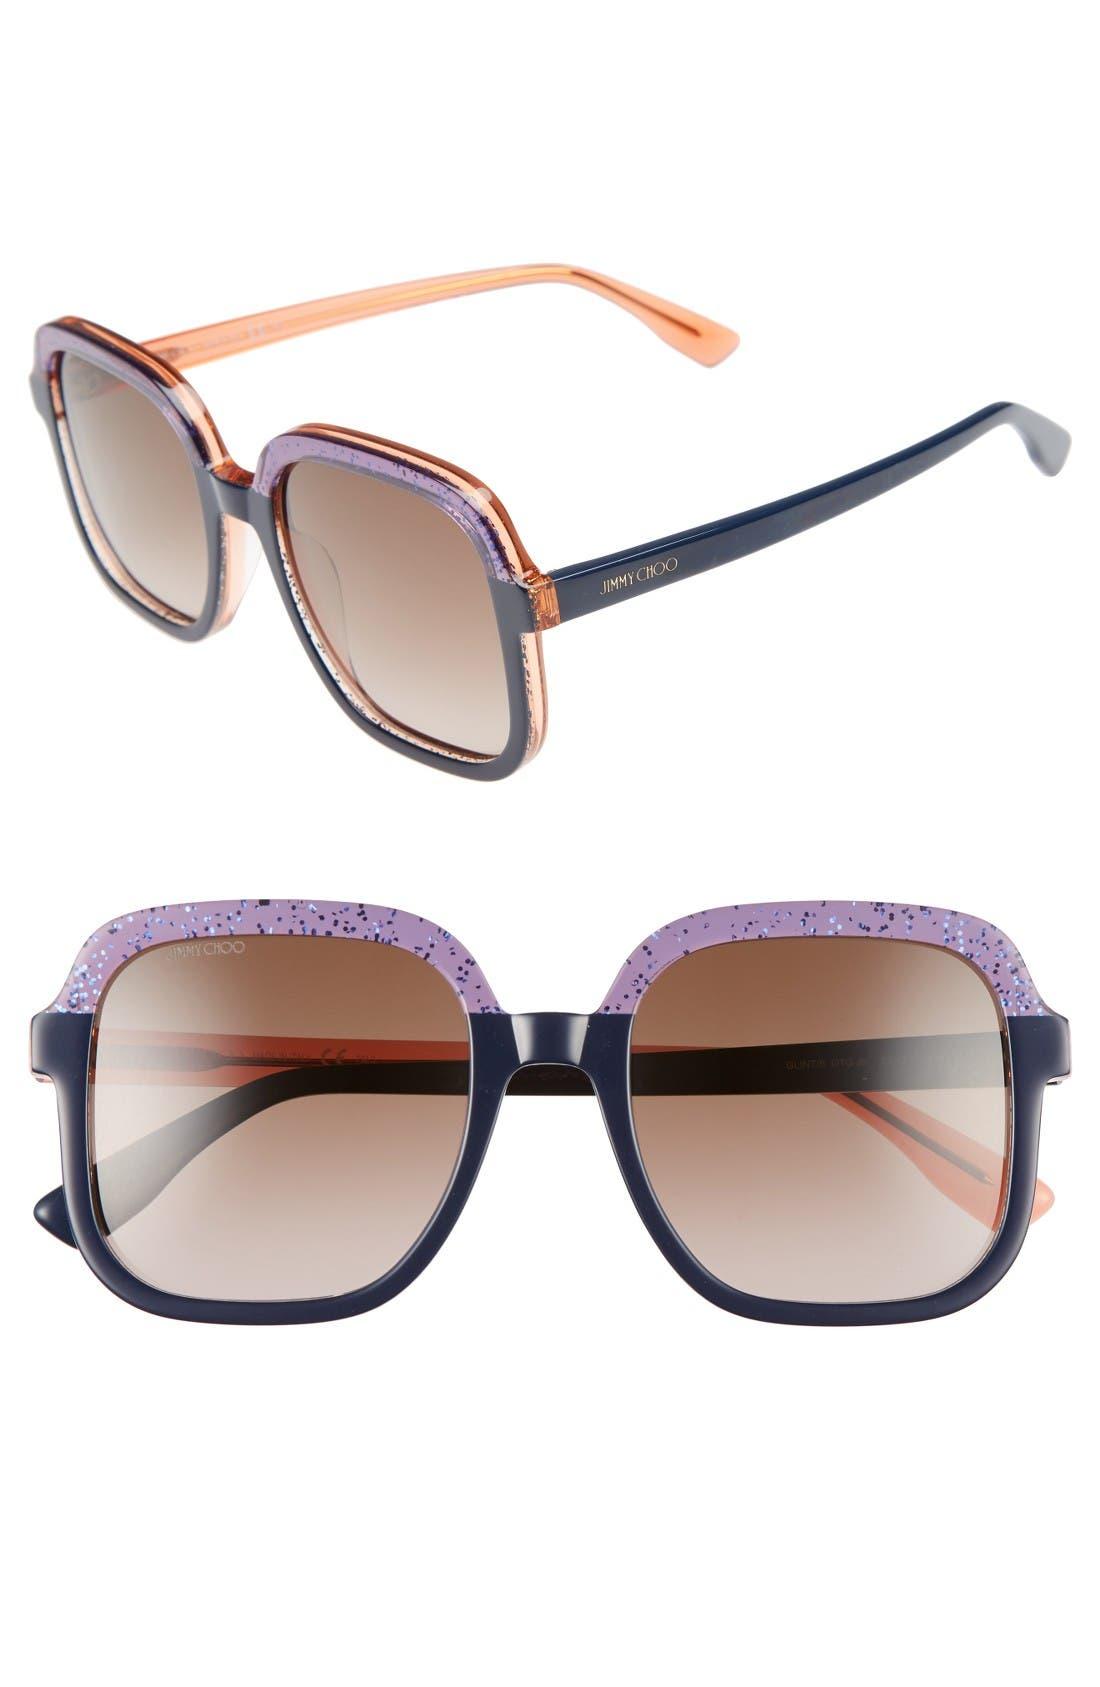 Jimmy Choo 53mm Glitter Frame Sunglasses